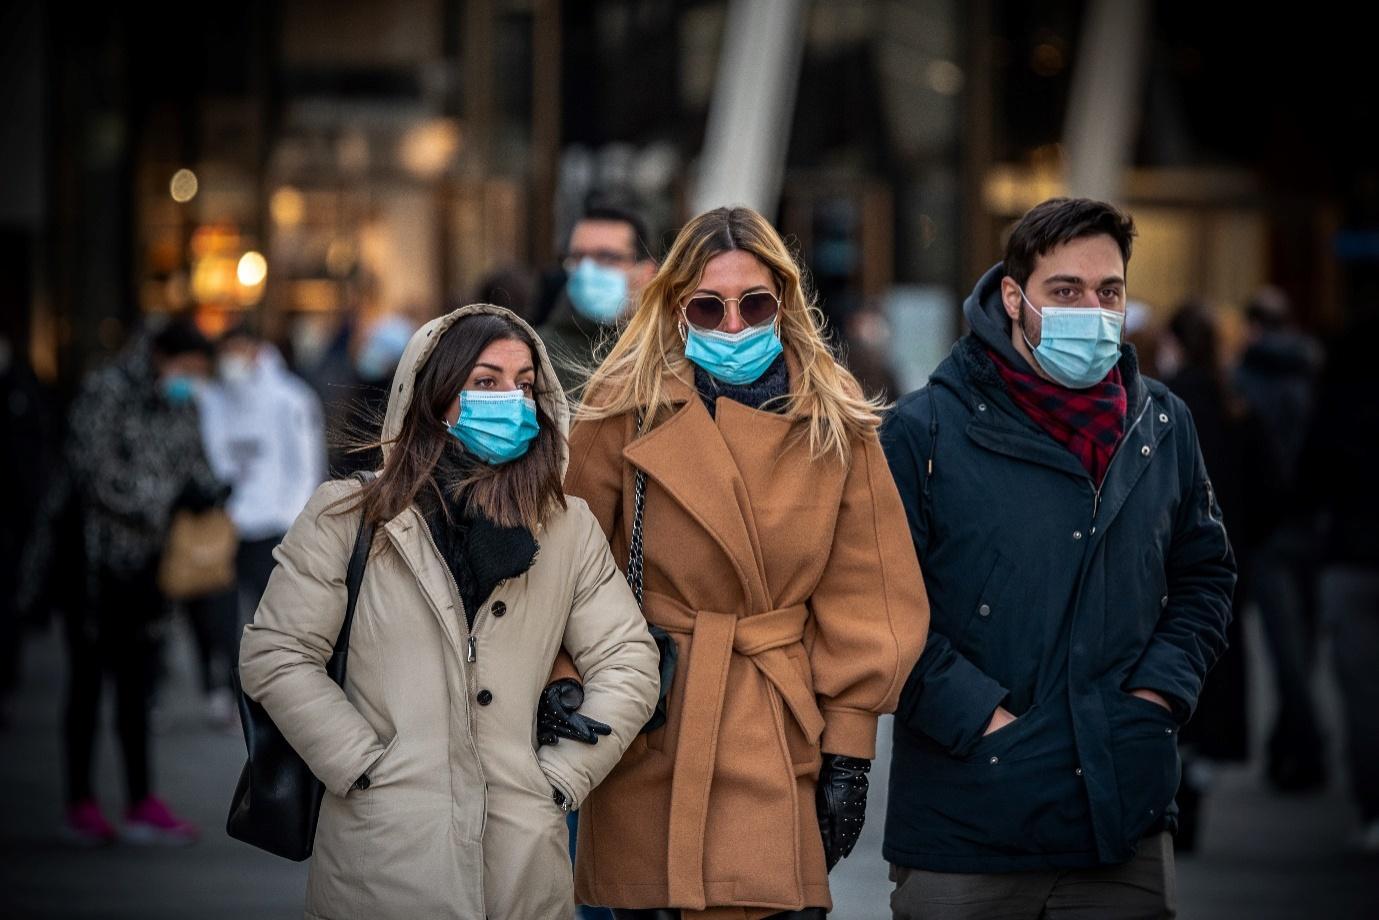 People outside wearing masks.